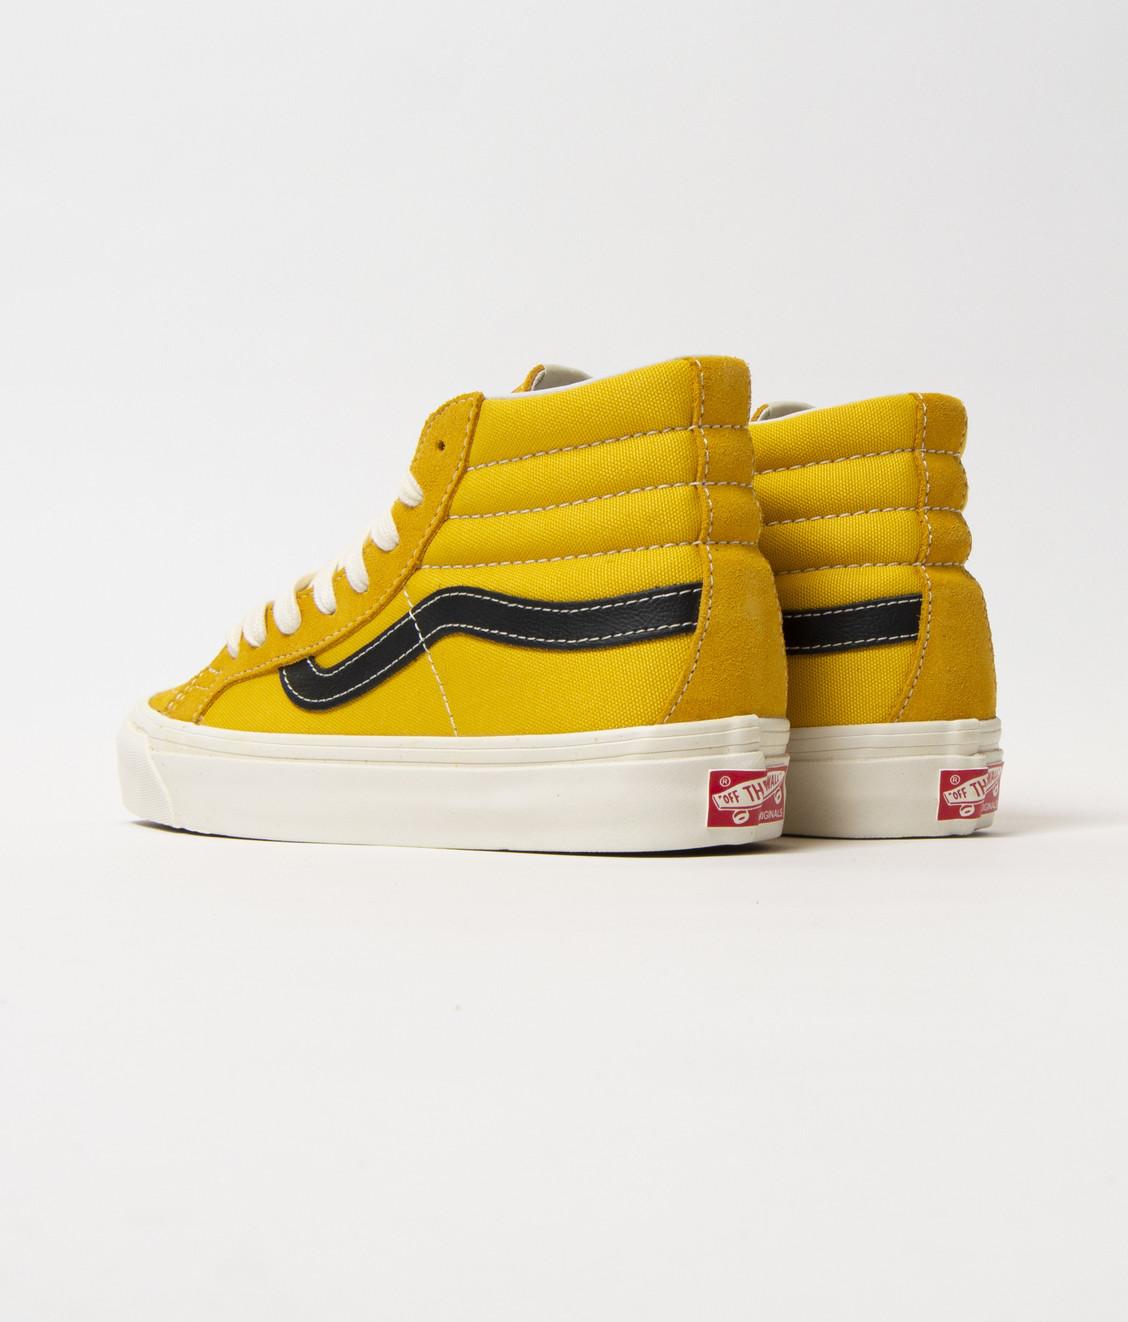 Vans Vans Vault OG SK8-Hi LX Yellow